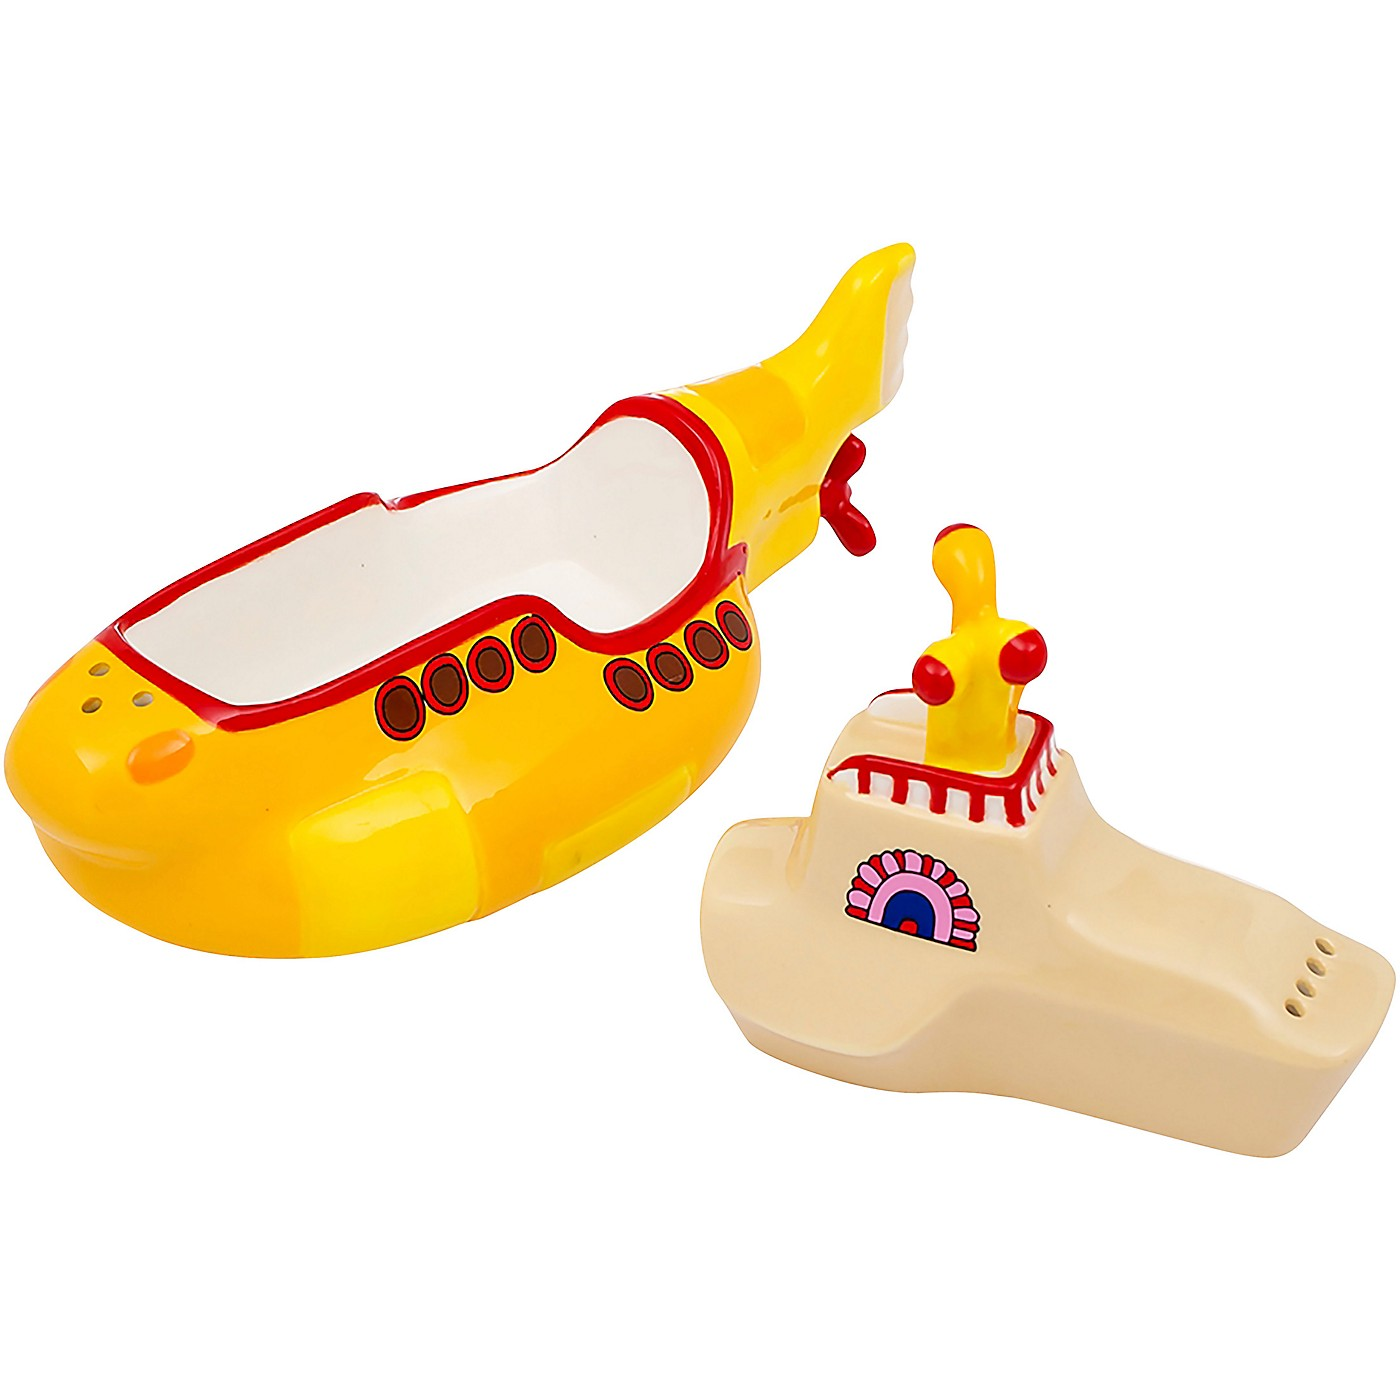 Vandor The Beatles Yellow Submarine Salt & Pepper Set thumbnail